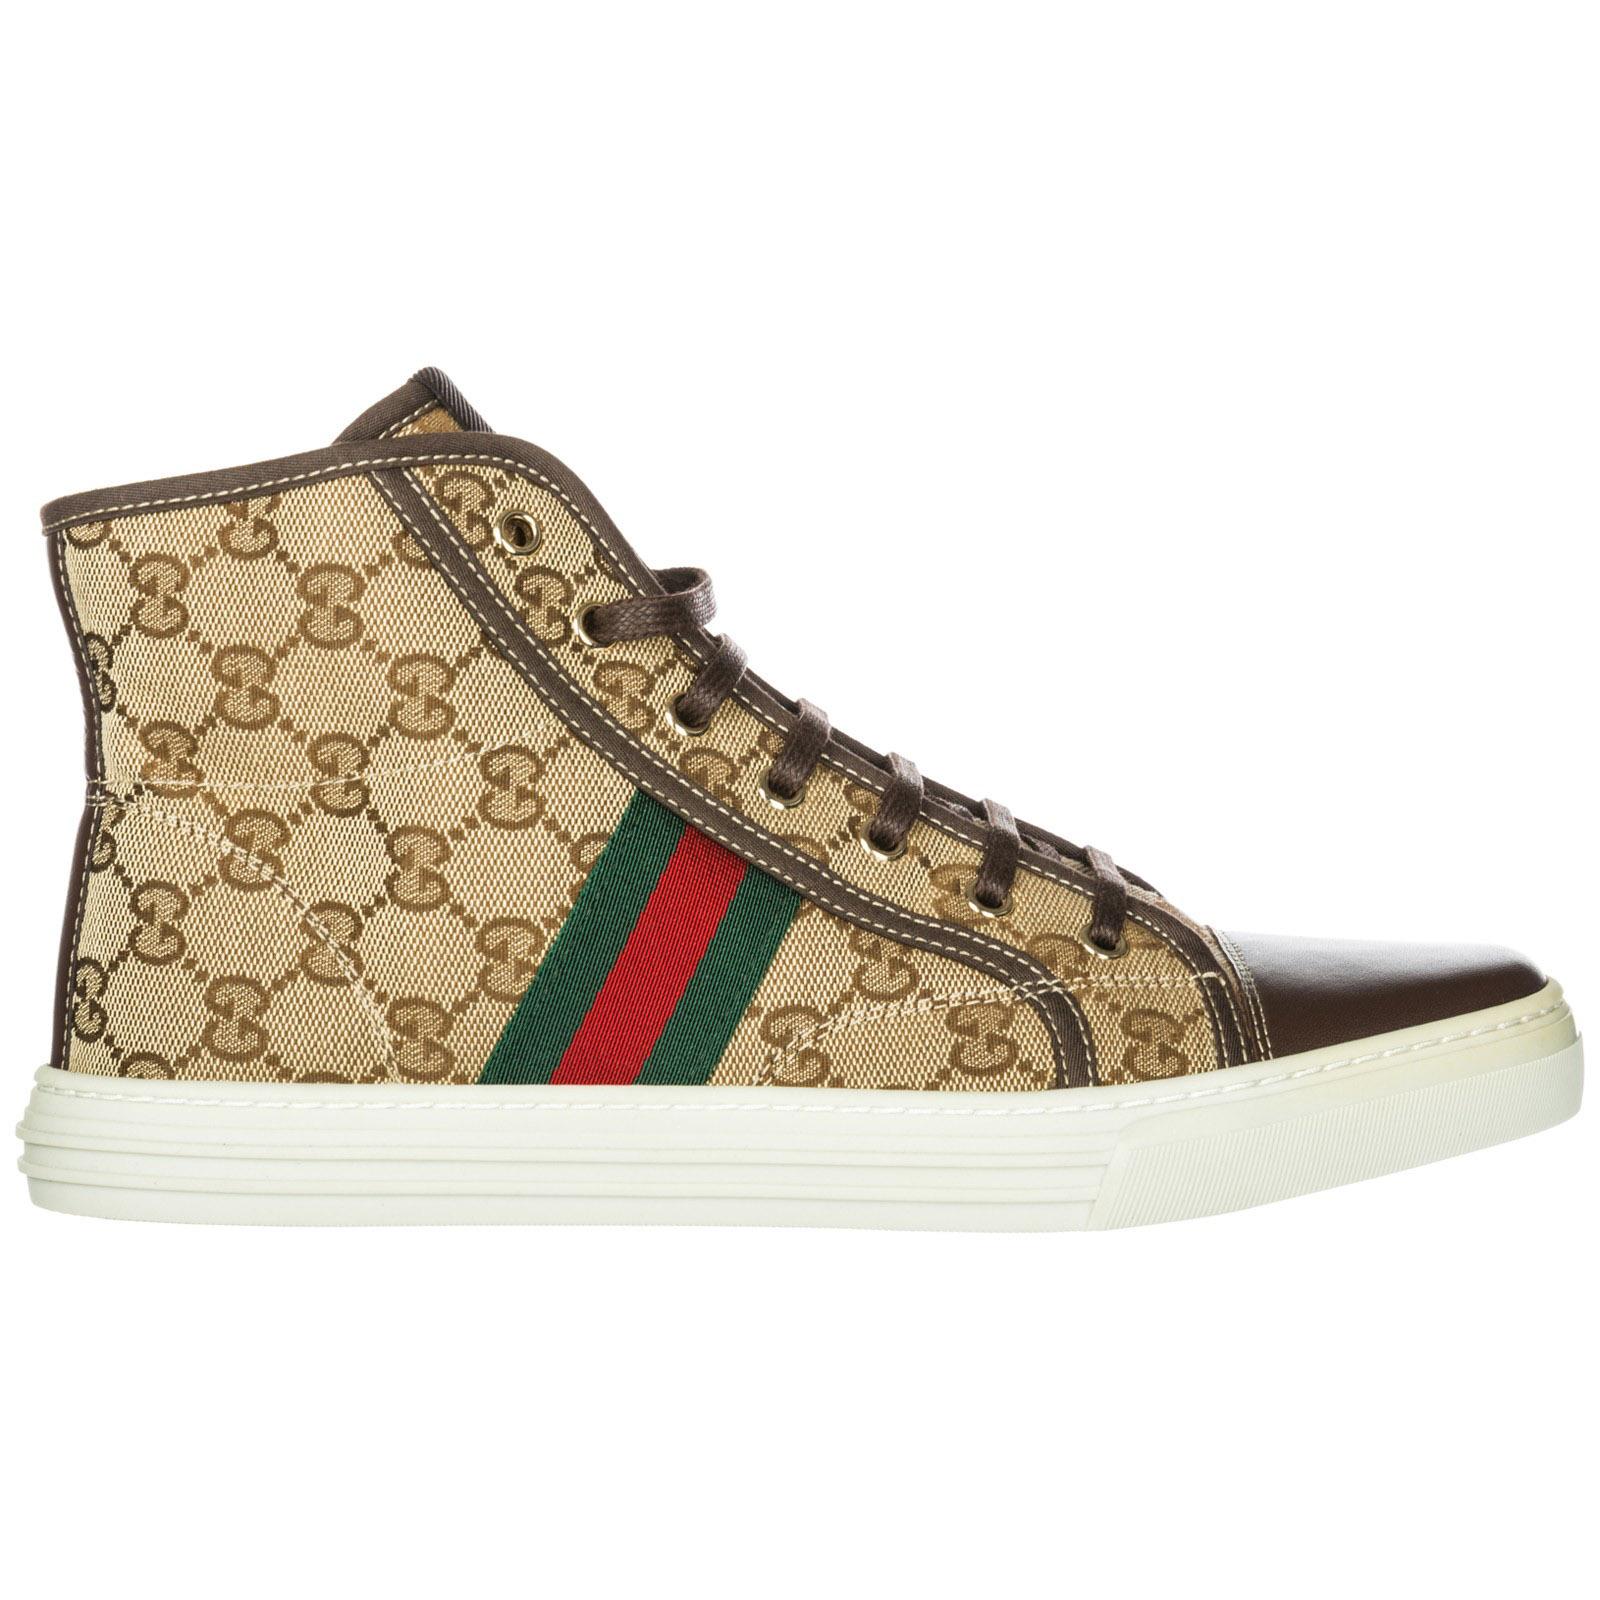 6ccd6cfb1e94 High top sneakers Gucci 283613FWCS09780 marrone